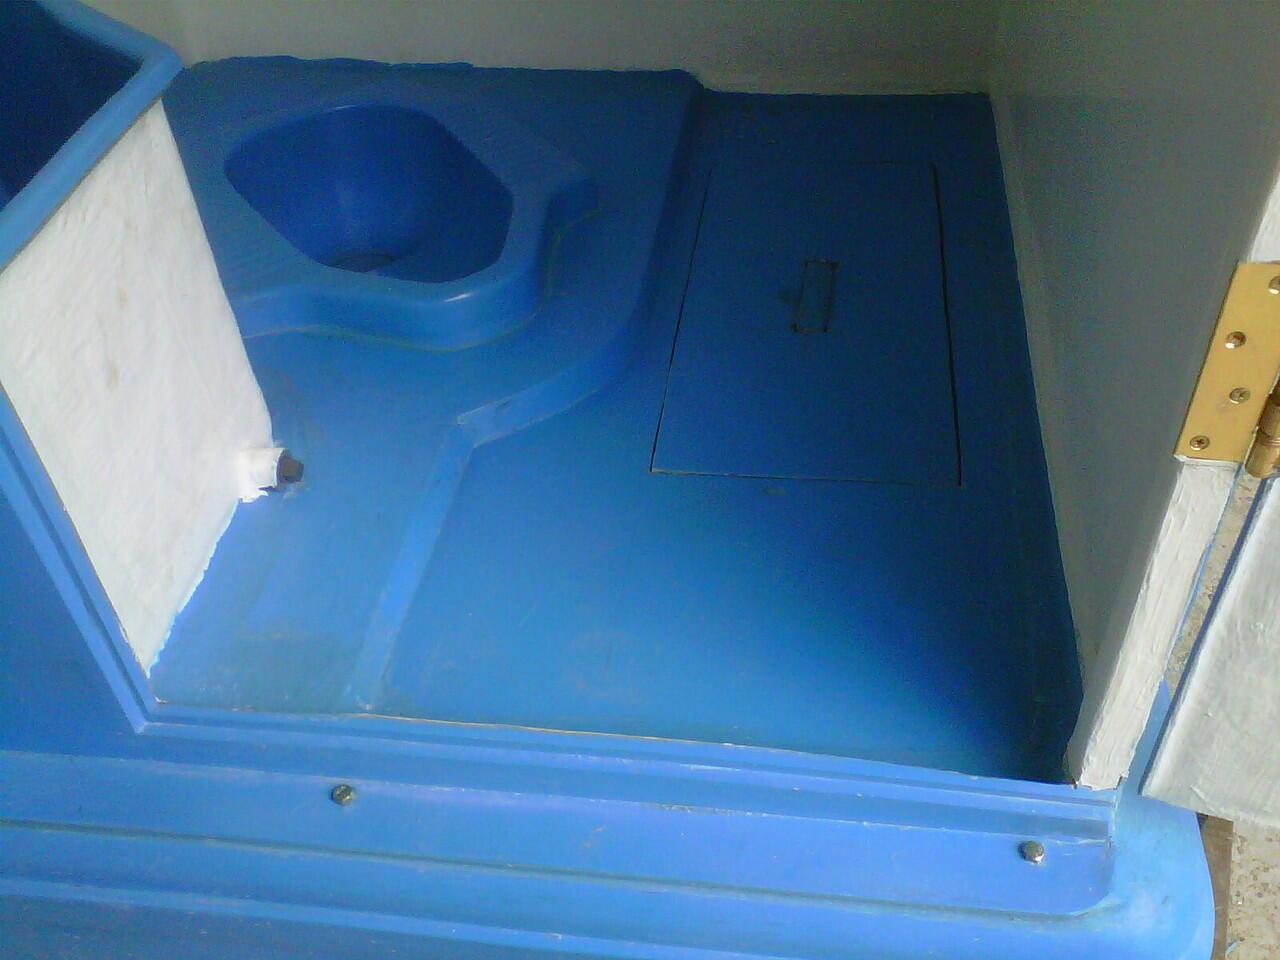 Toilet portable Biolast, Serbaguna Toilet portable, Modern toilet portable Biolast